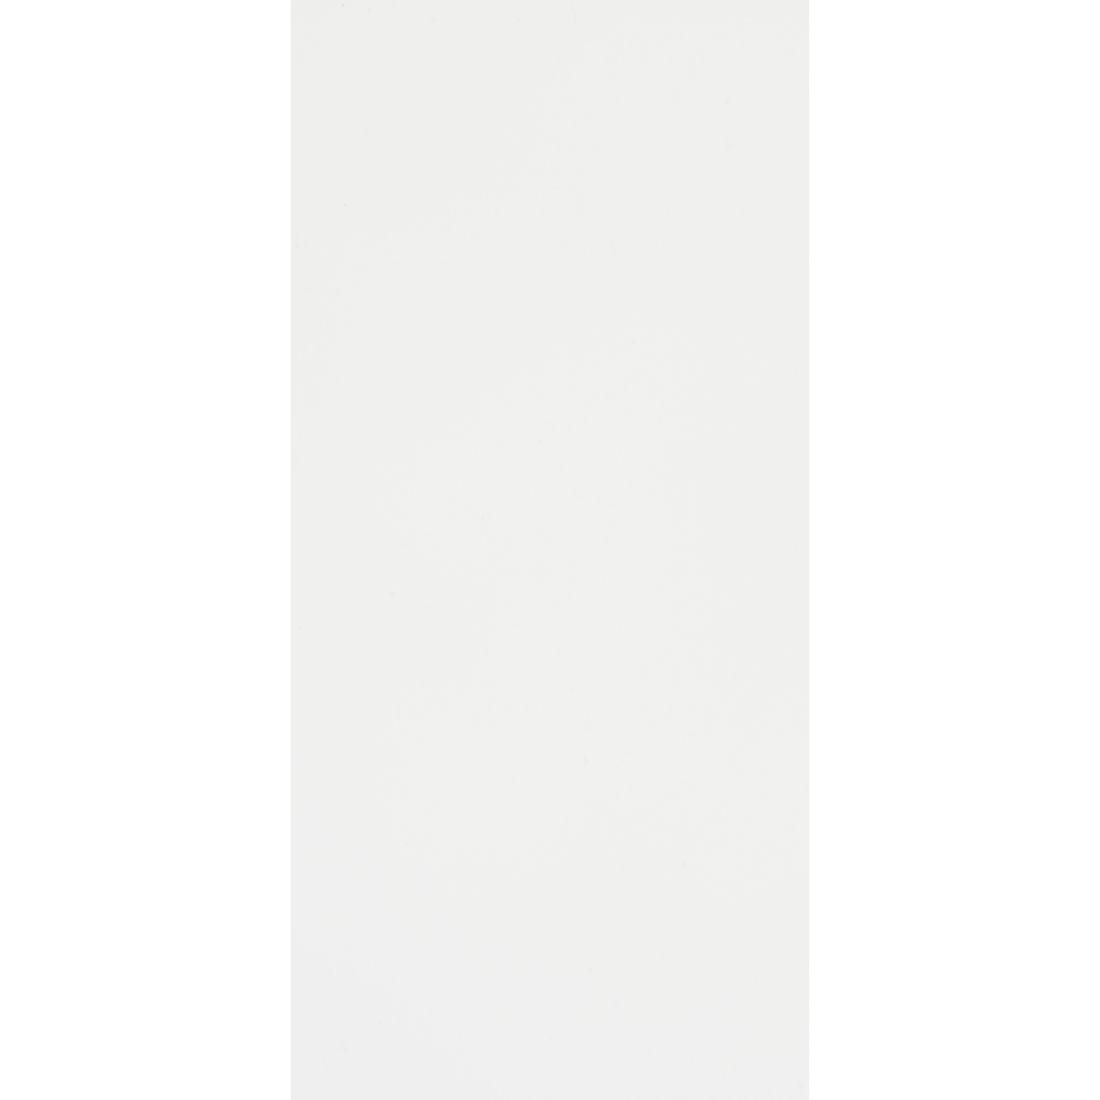 Classic Wall Lining Panel Polar Gloss 2400 x 1200 x 4.5mm